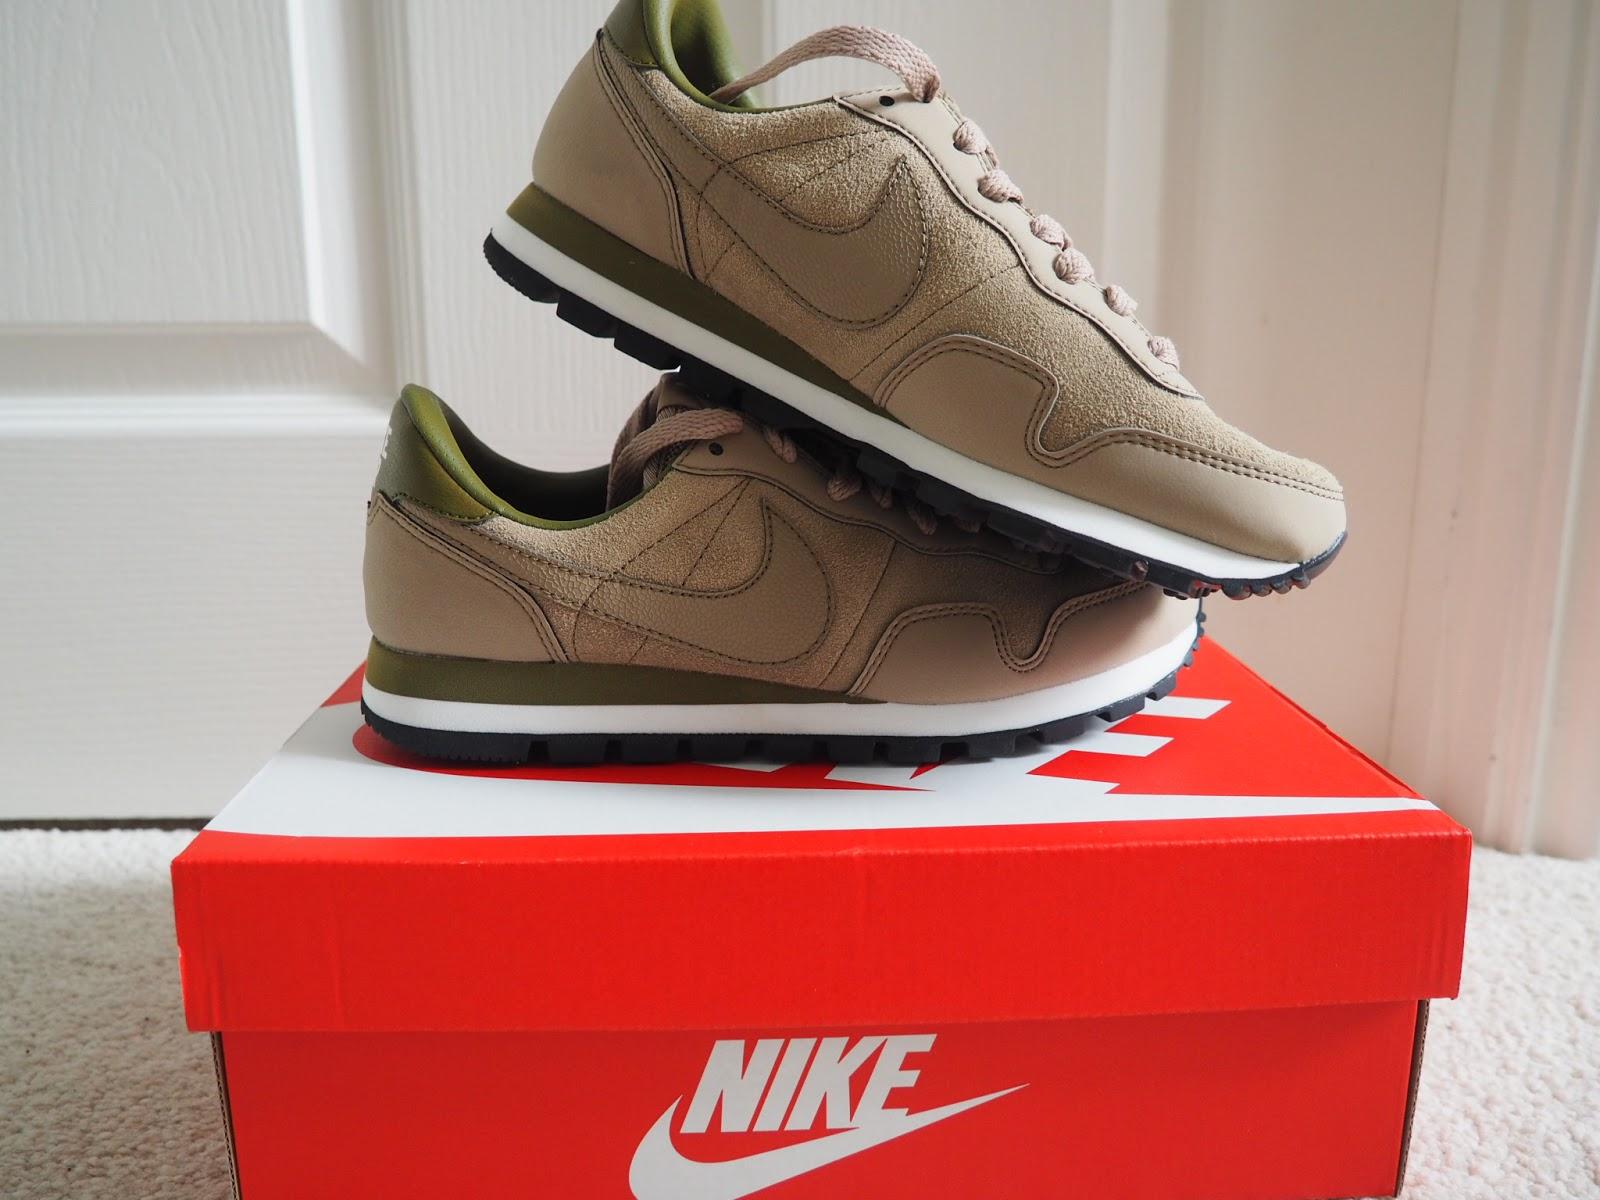 nike pegasus 83 shoes beige khaki blog post favourites desert cameo